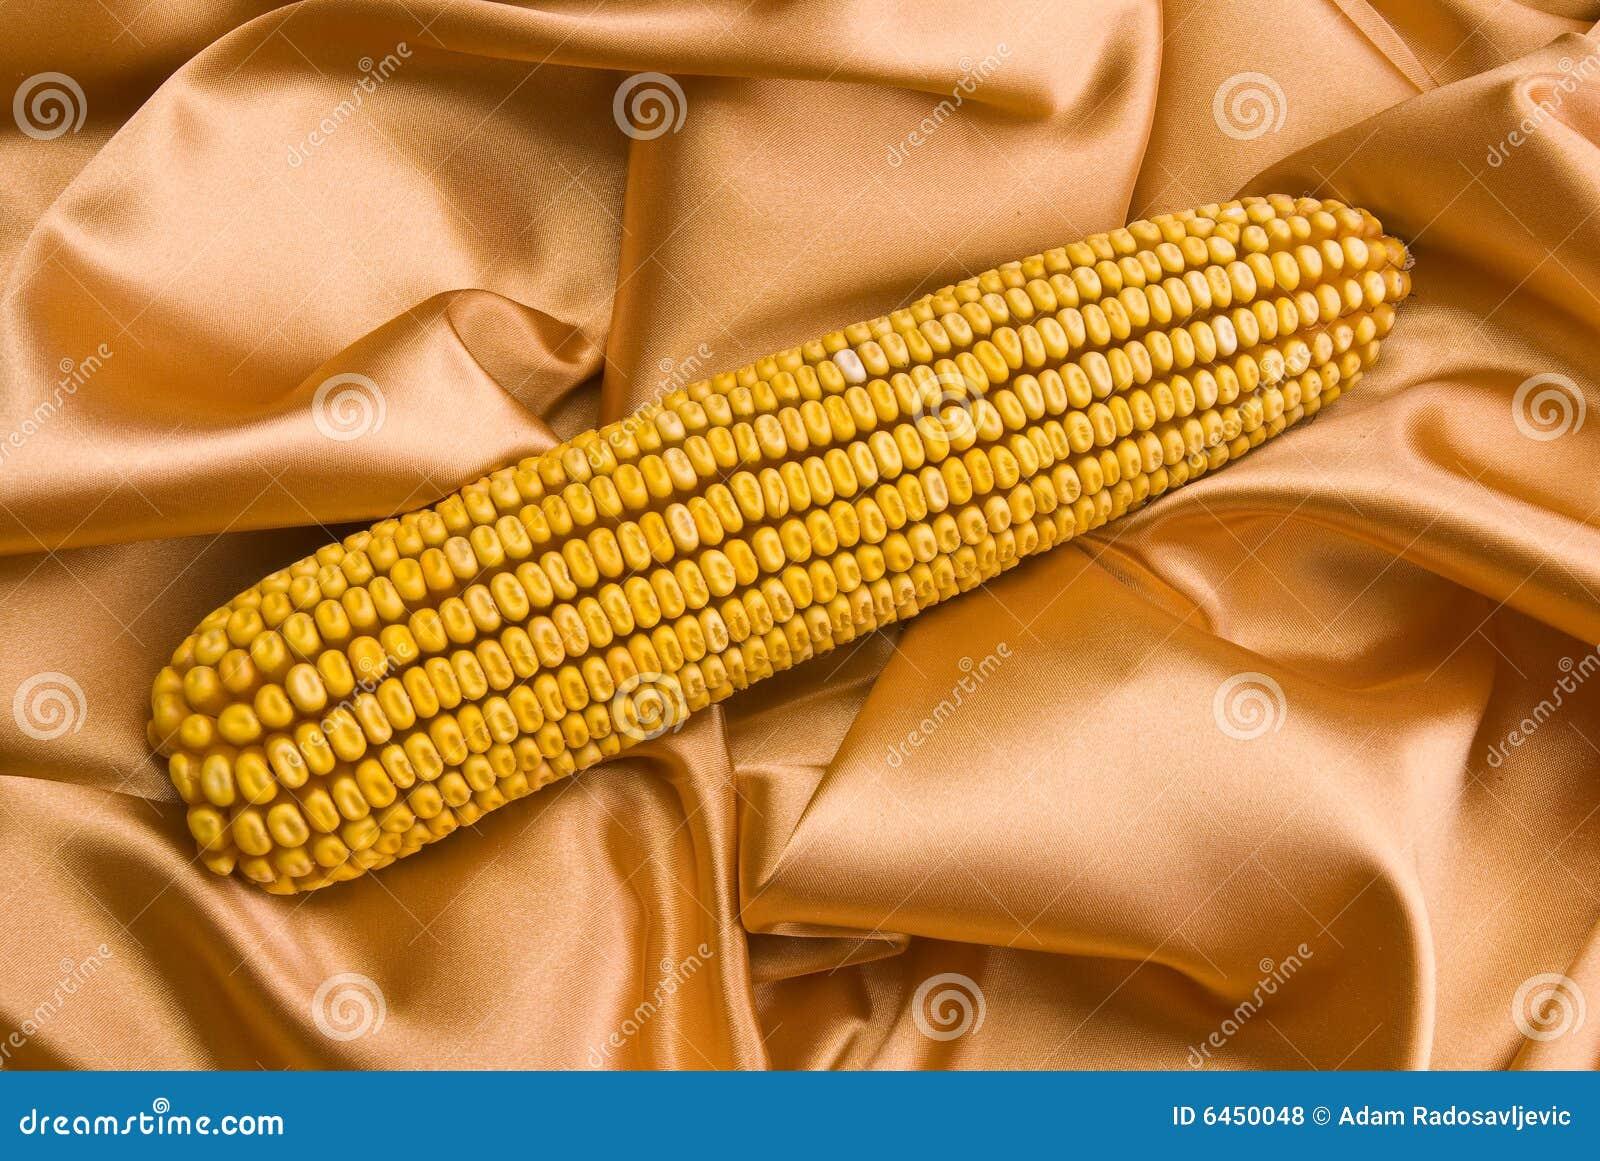 Kolby kukurydzy satin